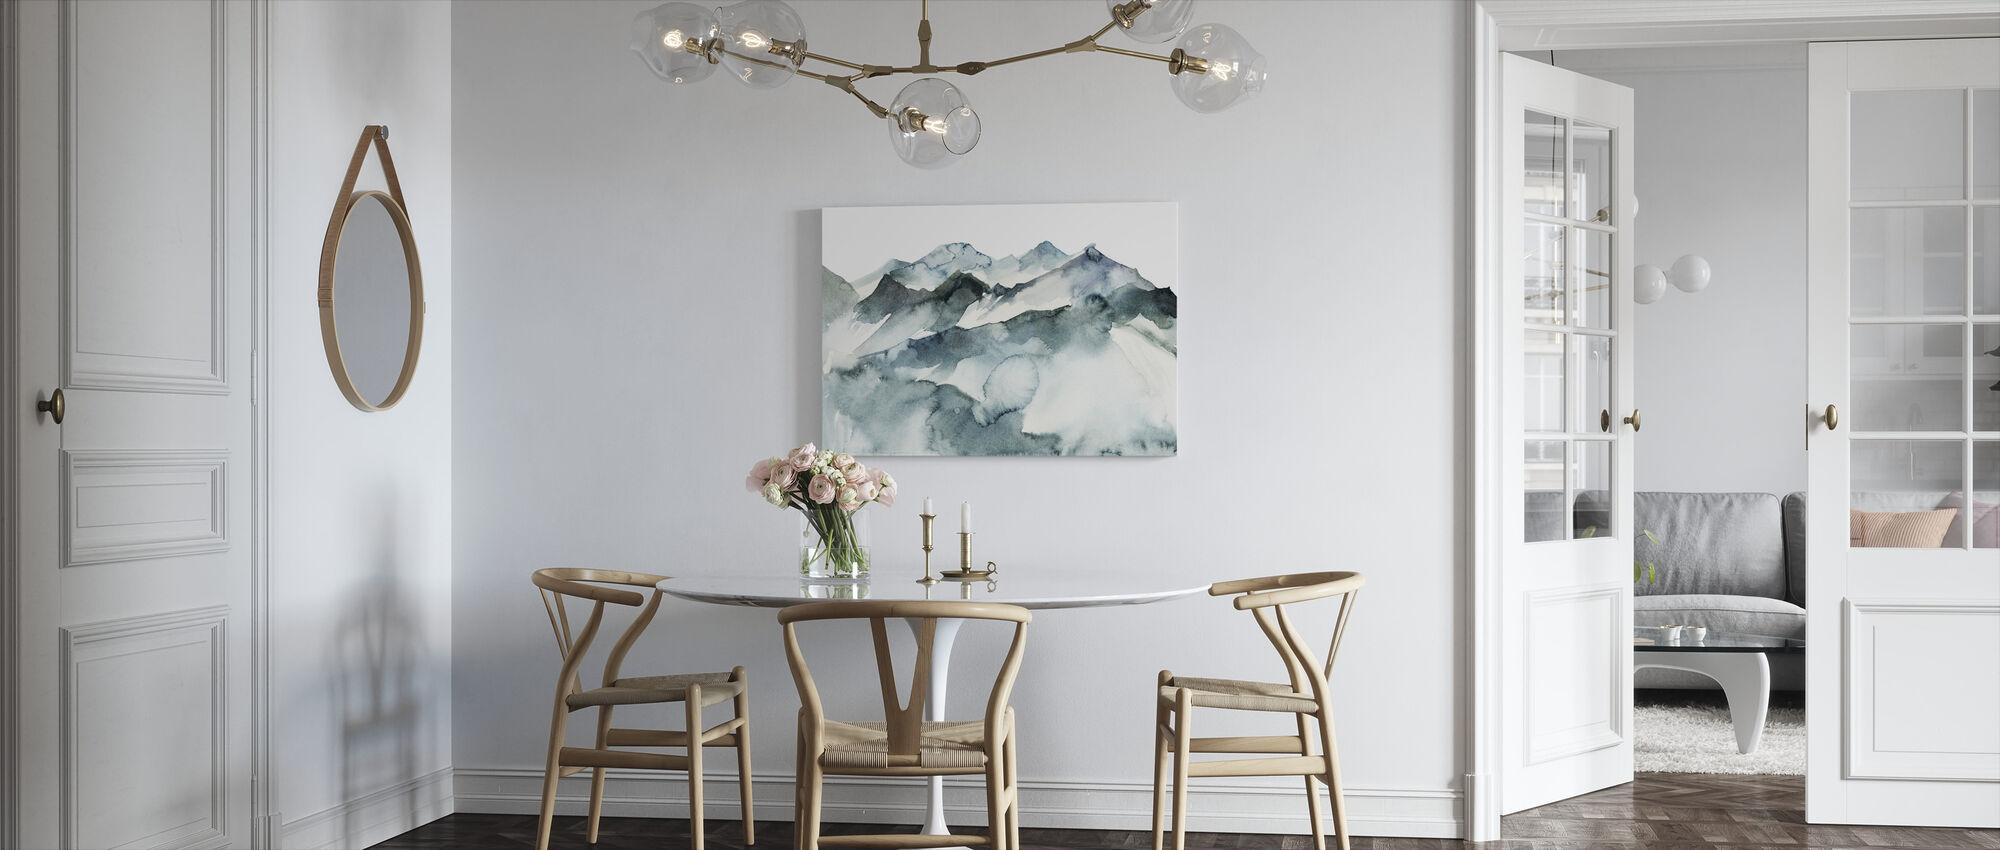 Watercolor Mountains - Canvas print - Kitchen